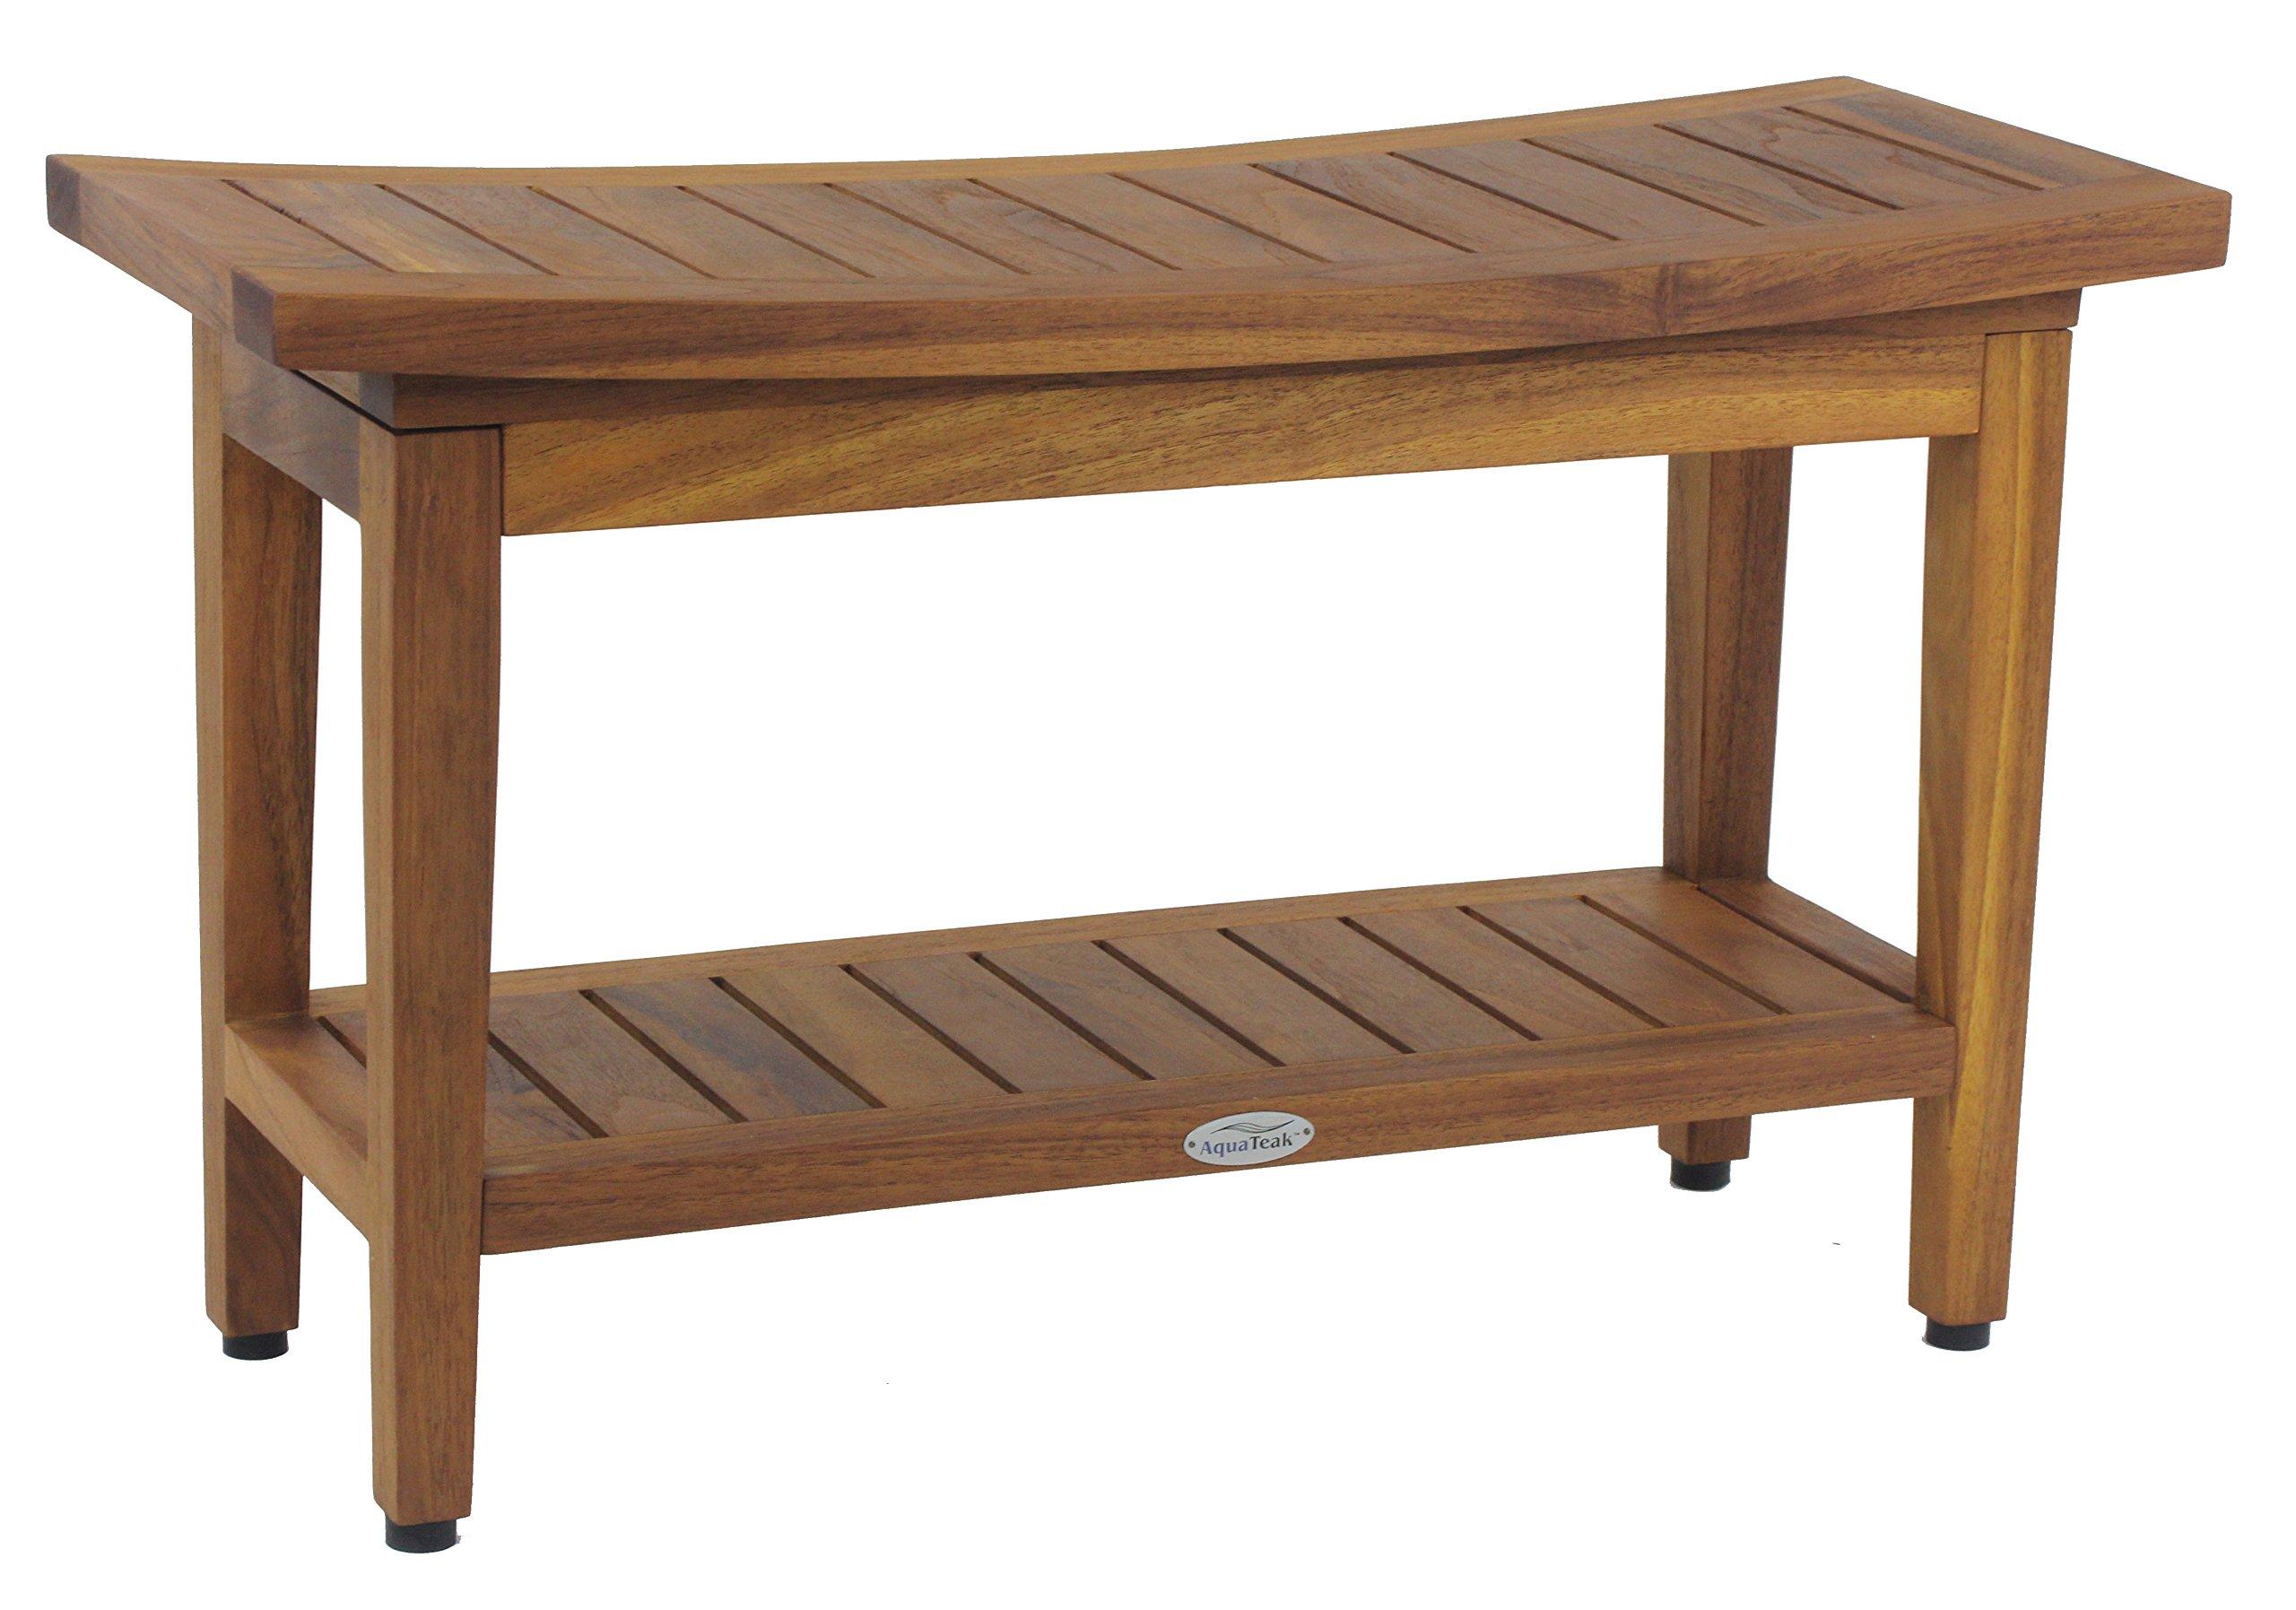 Maluku 30'' Teak Shower Bench with Shelf